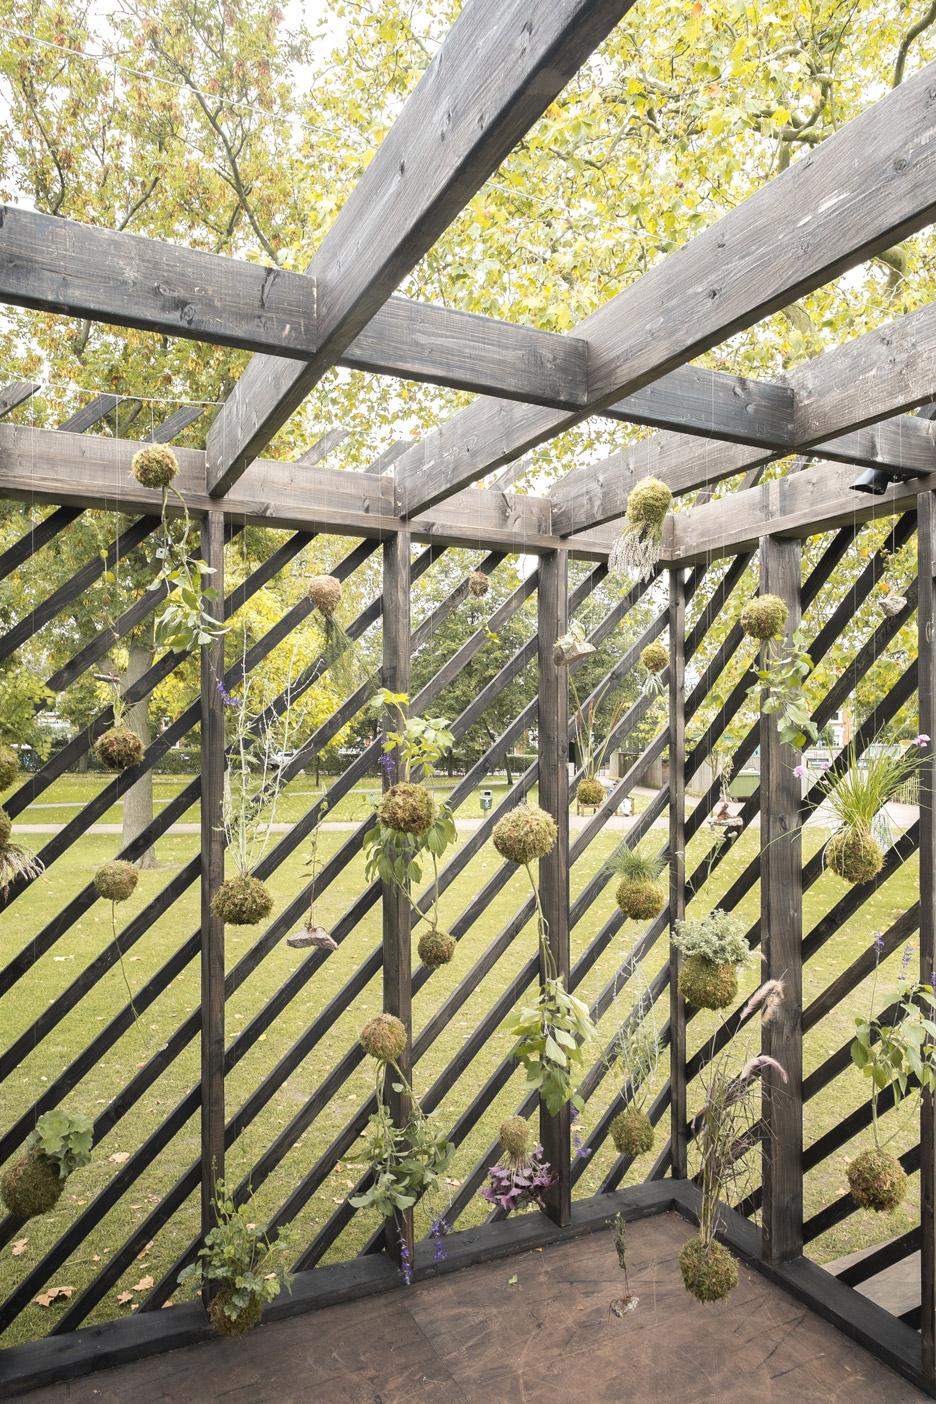 Claridge Architects' pavilion for Plants Out Of Place exhibition